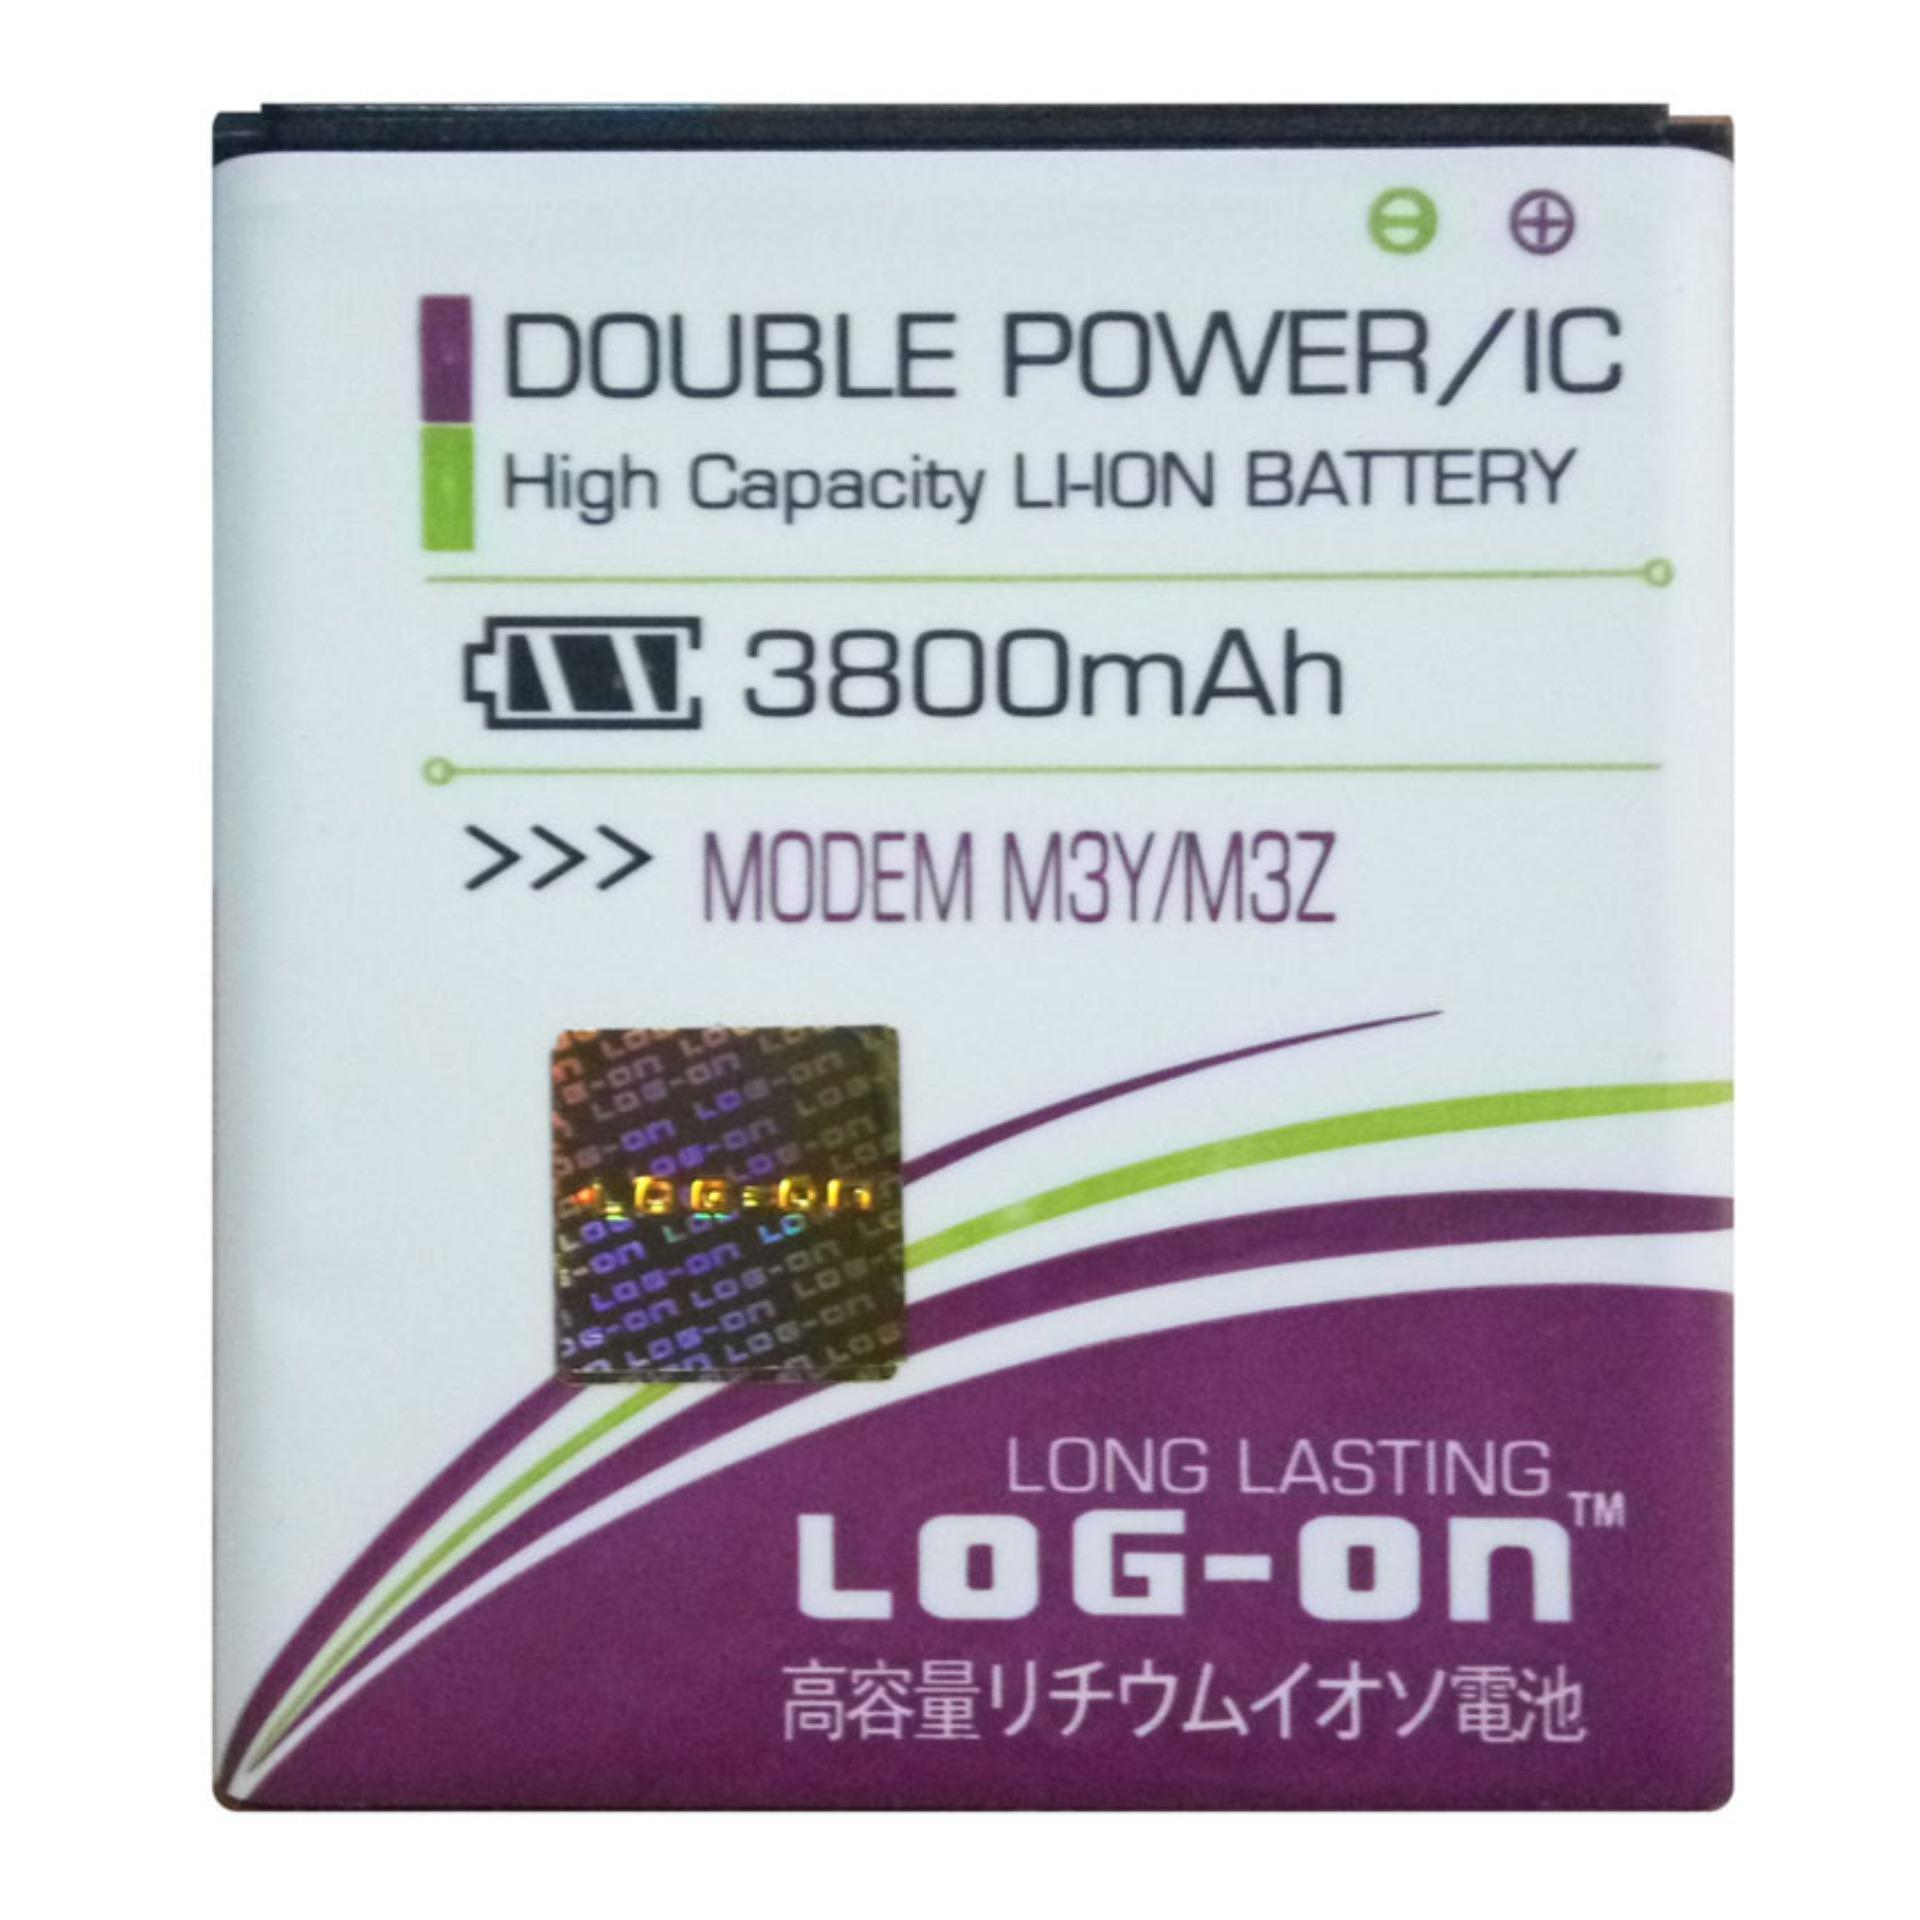 Log On Baterai Modem WIFI Smartfren Andromax M3Y M3Z - Double Power Battery - 3800 mAh